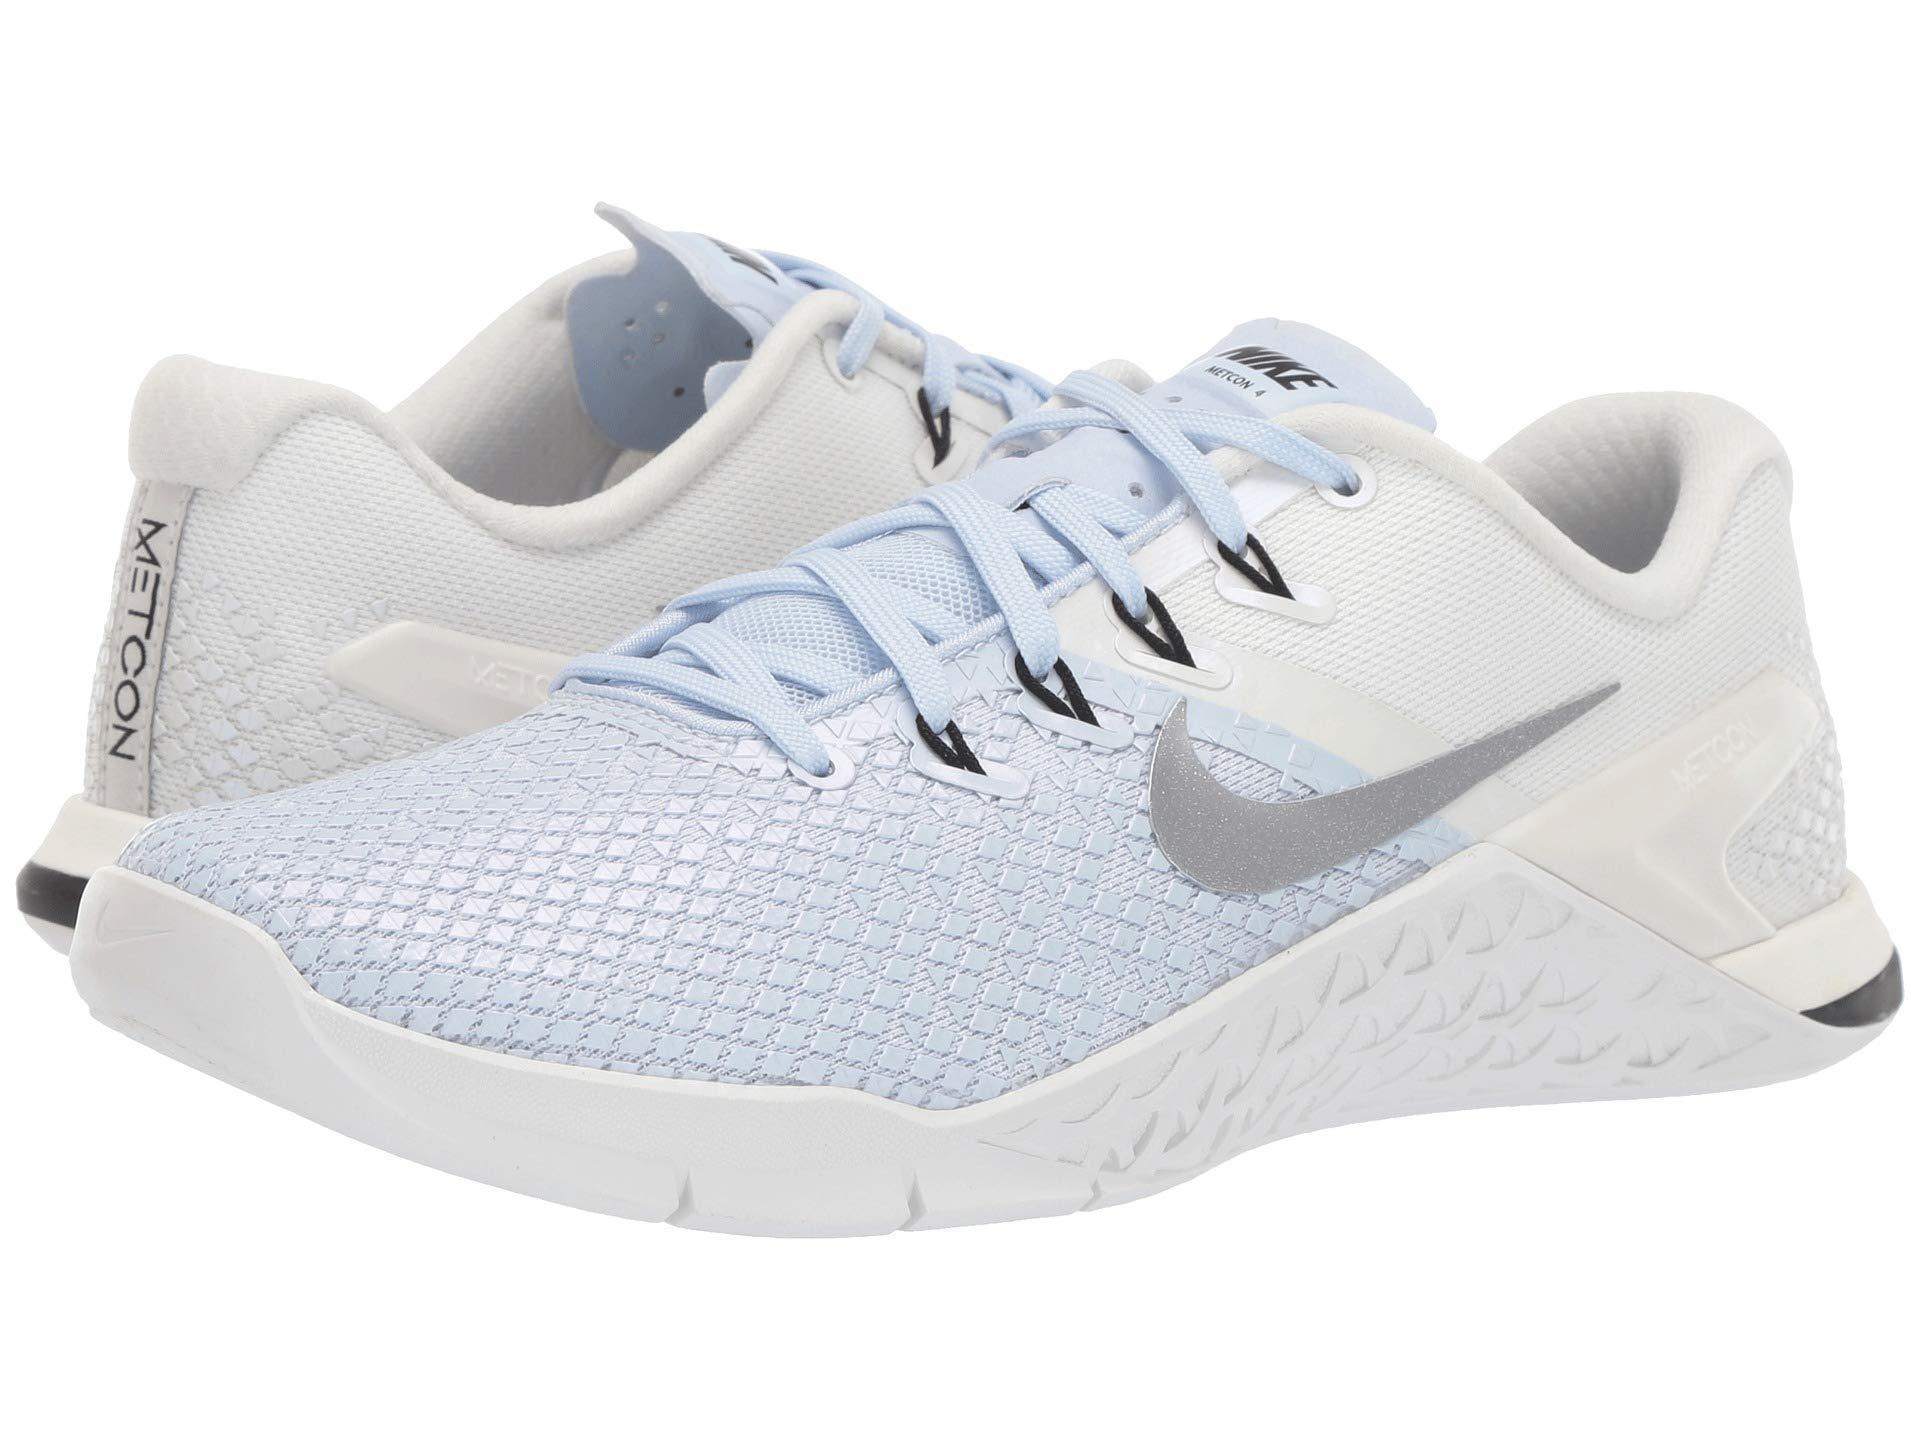 Nike. Metcon 4 Xd Metallic (half Blue metallic Silver sail black) Women s  Cross Training Shoes 39f981573